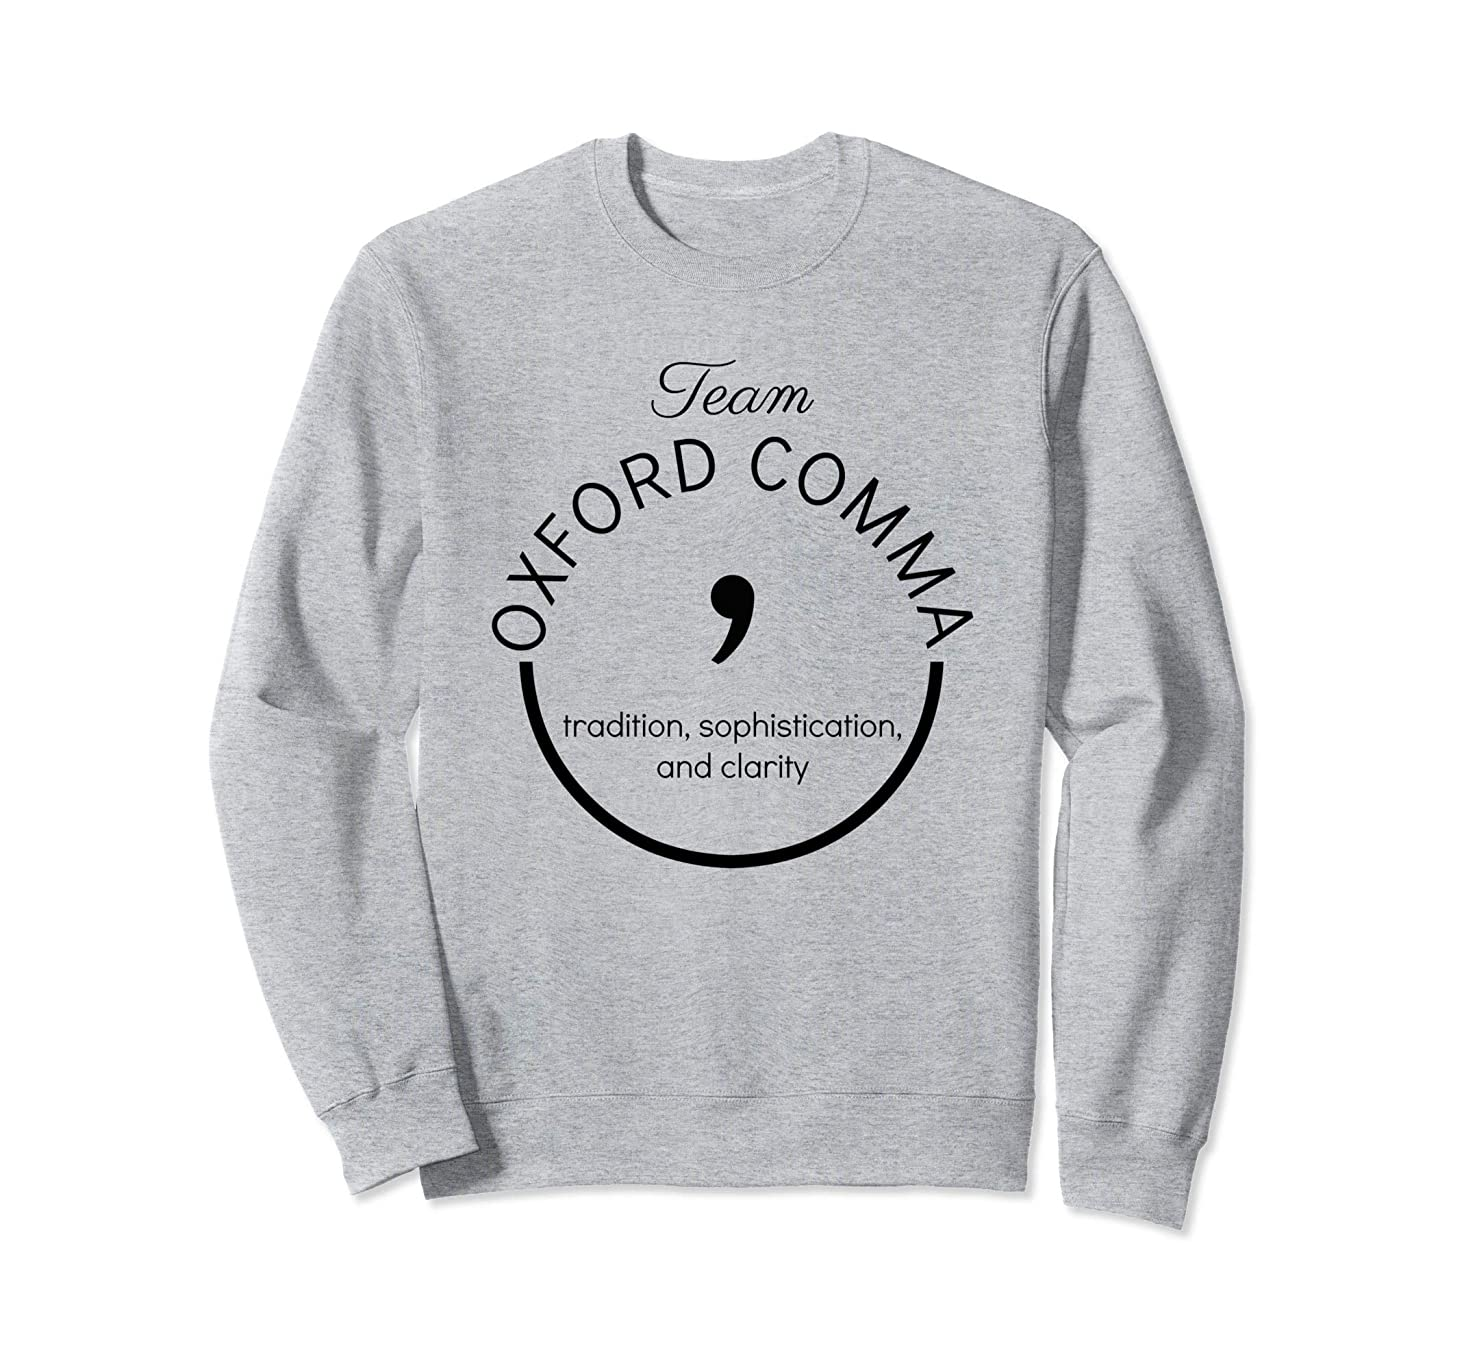 Writer Editor Gift Team Oxford Comma Grammar Police Shirt Sweatshirt